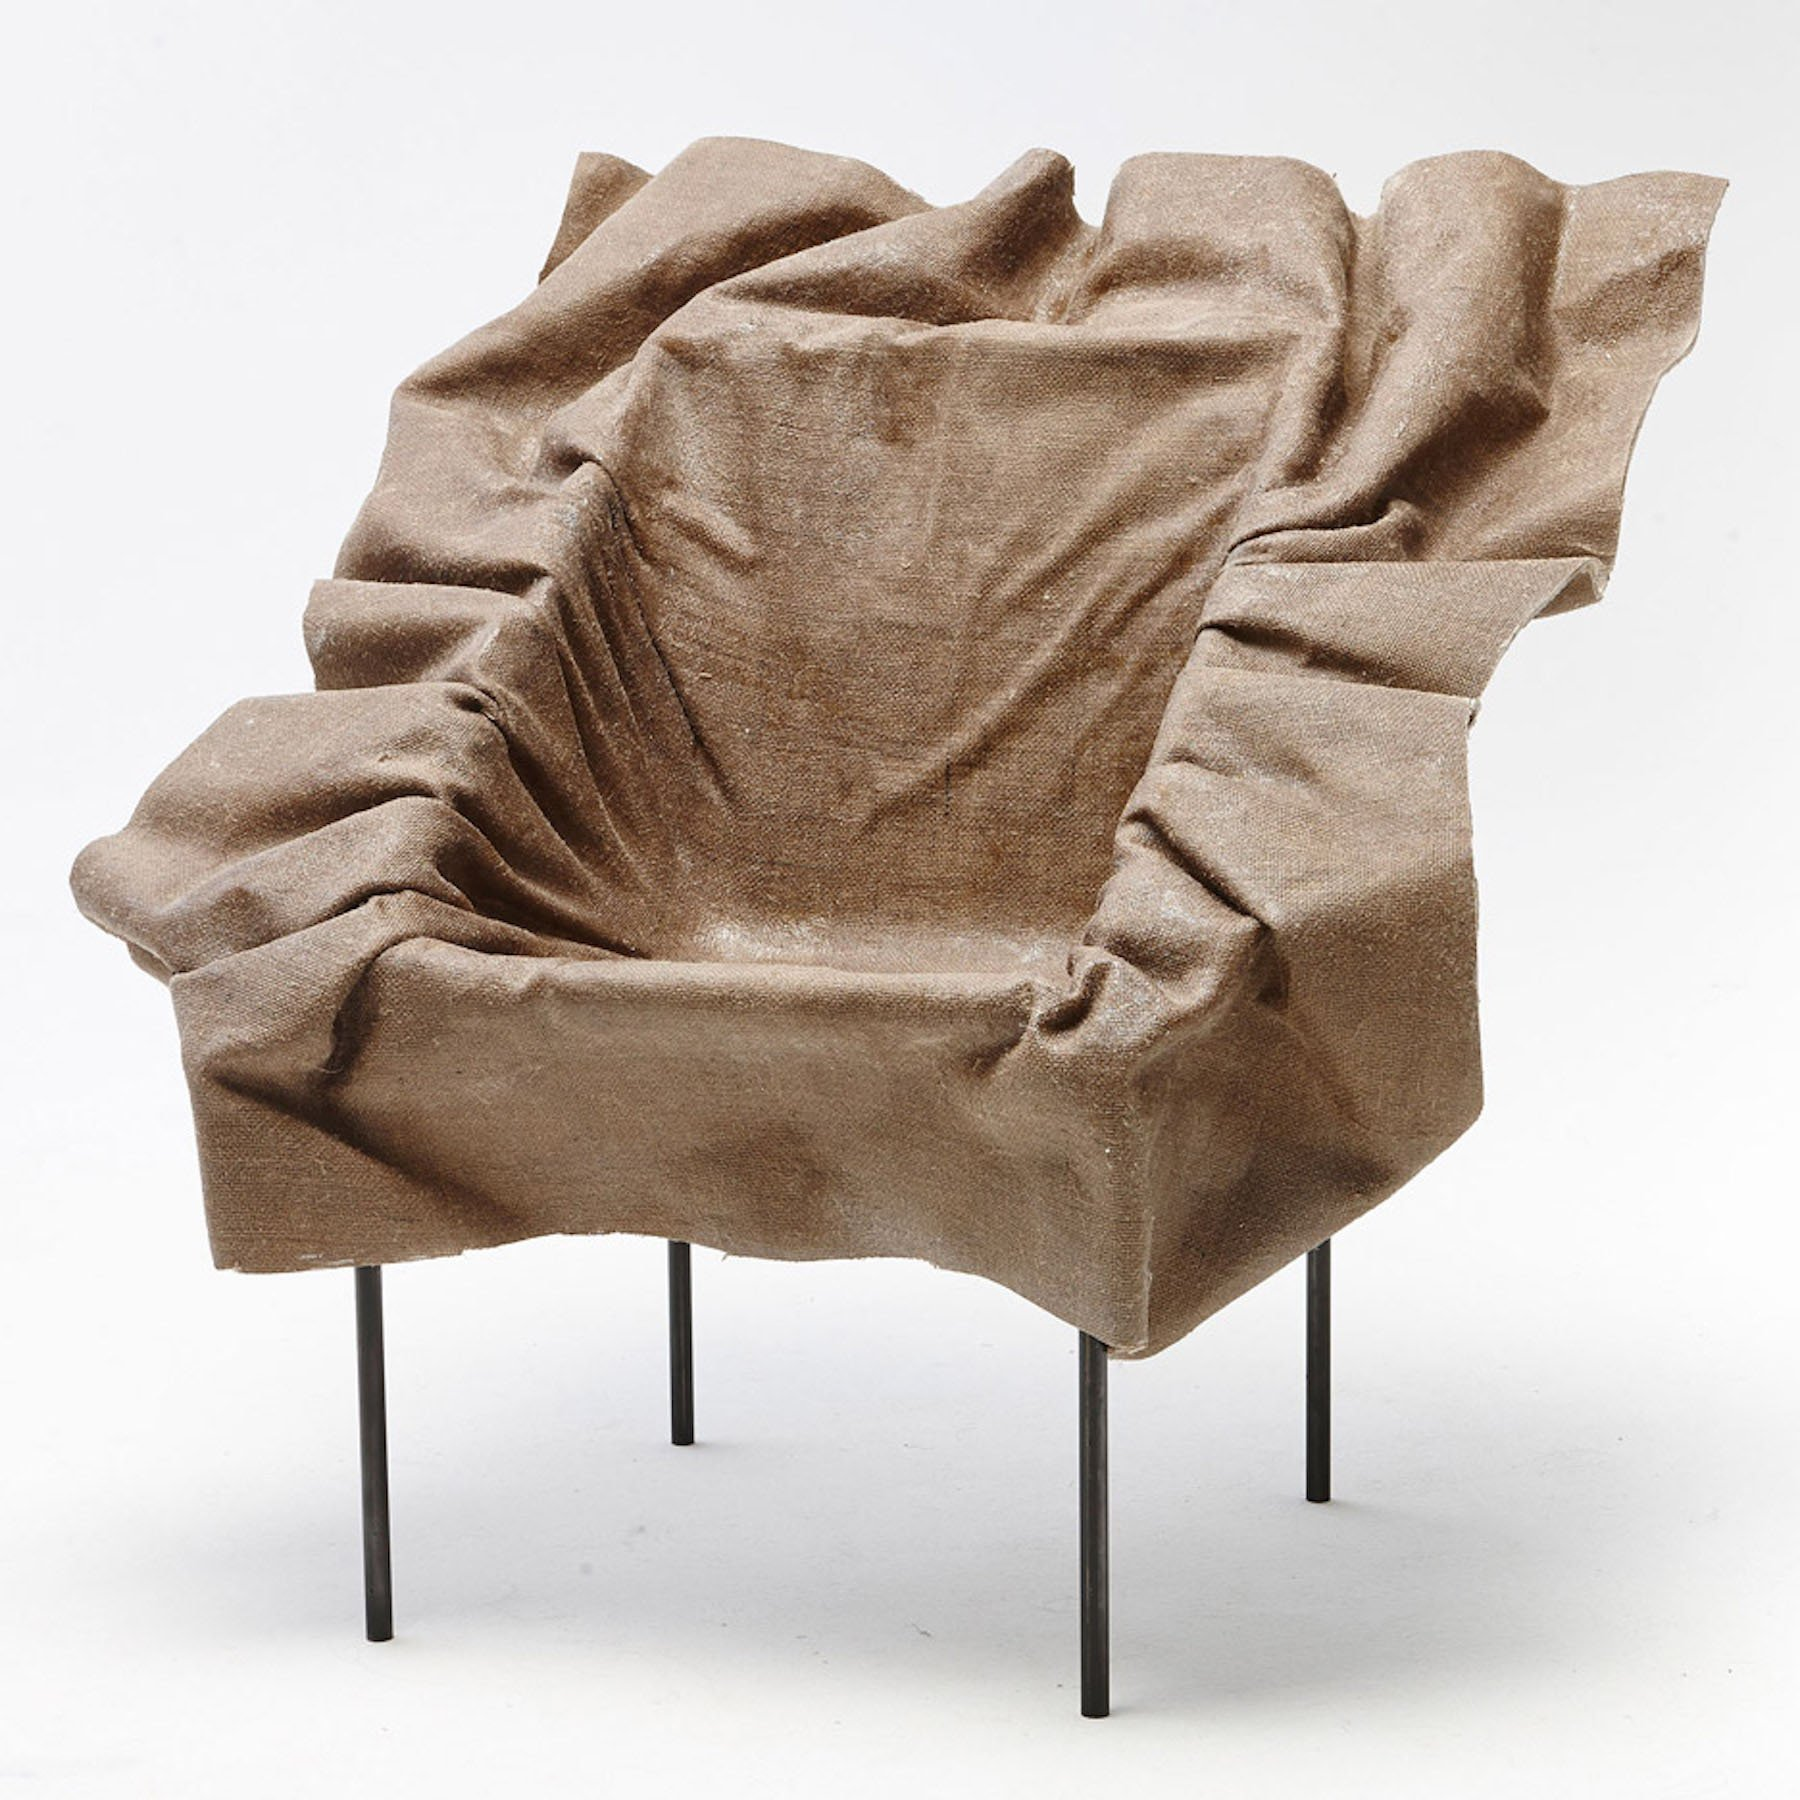 iGNANT-Design-Demeter-Fogarasi-Poetic-Furniture-Frozen-Textiles-07